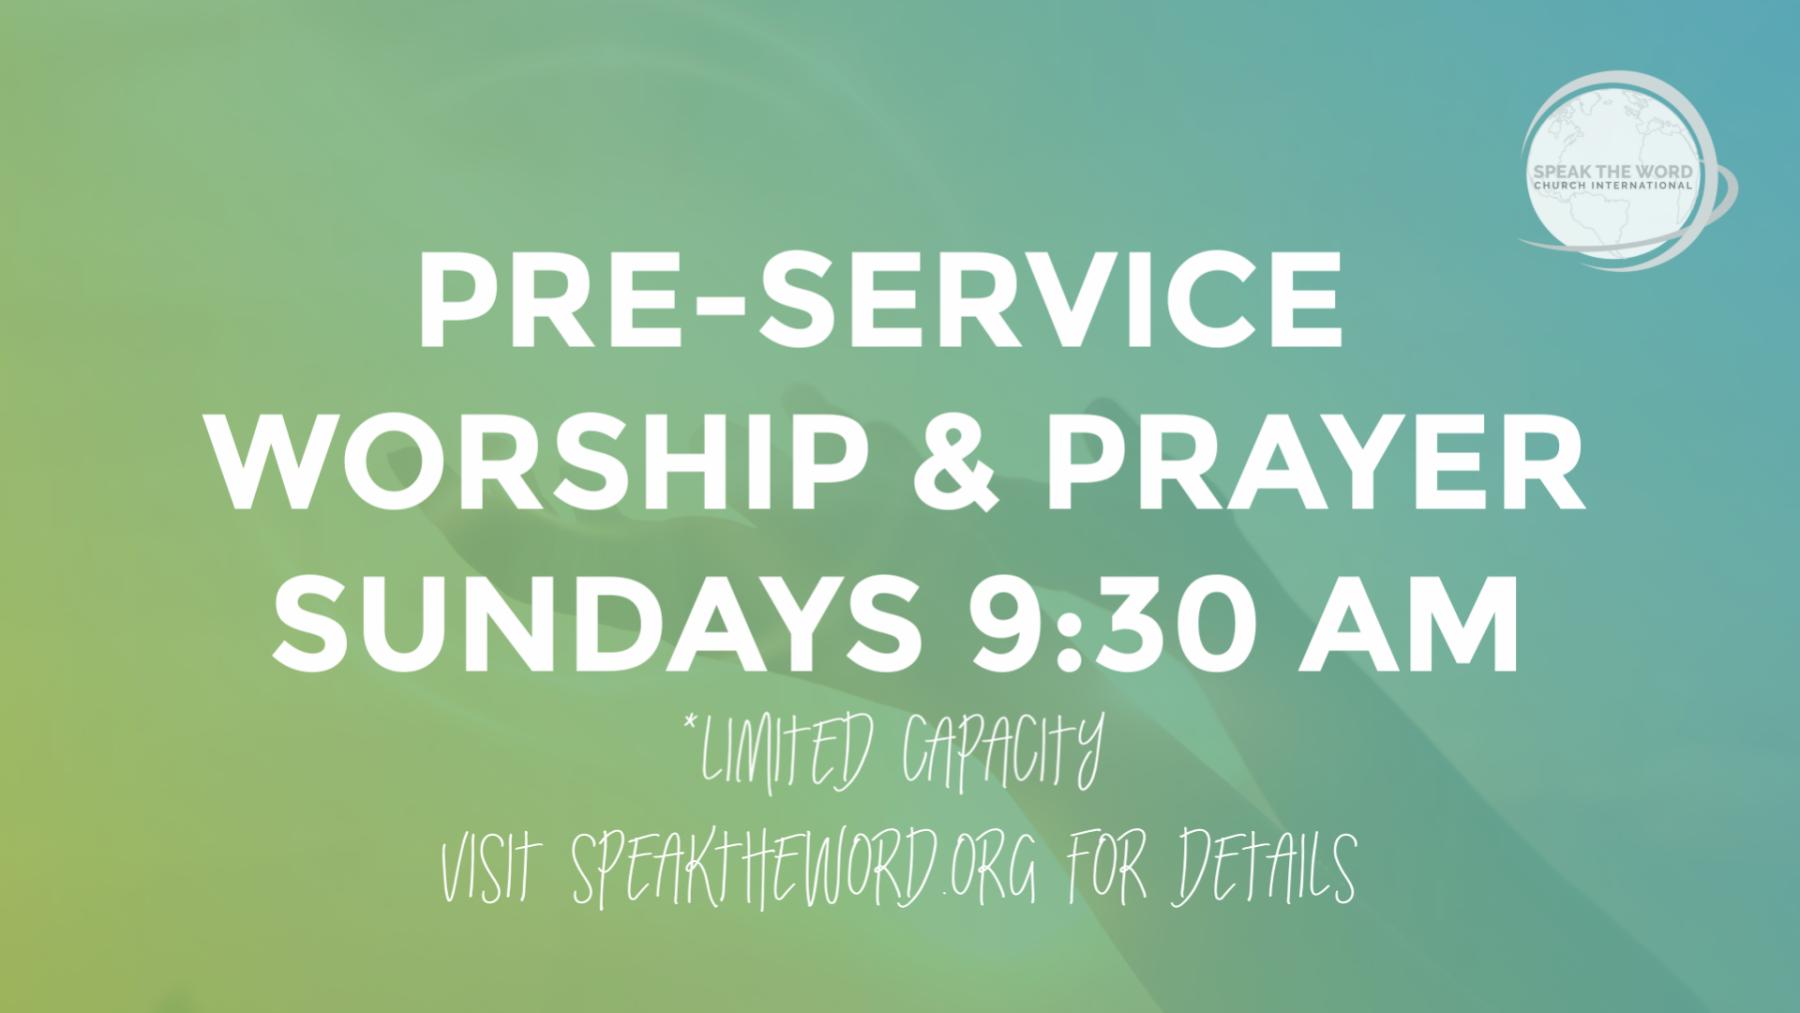 Pre-Service Worship & Prayer